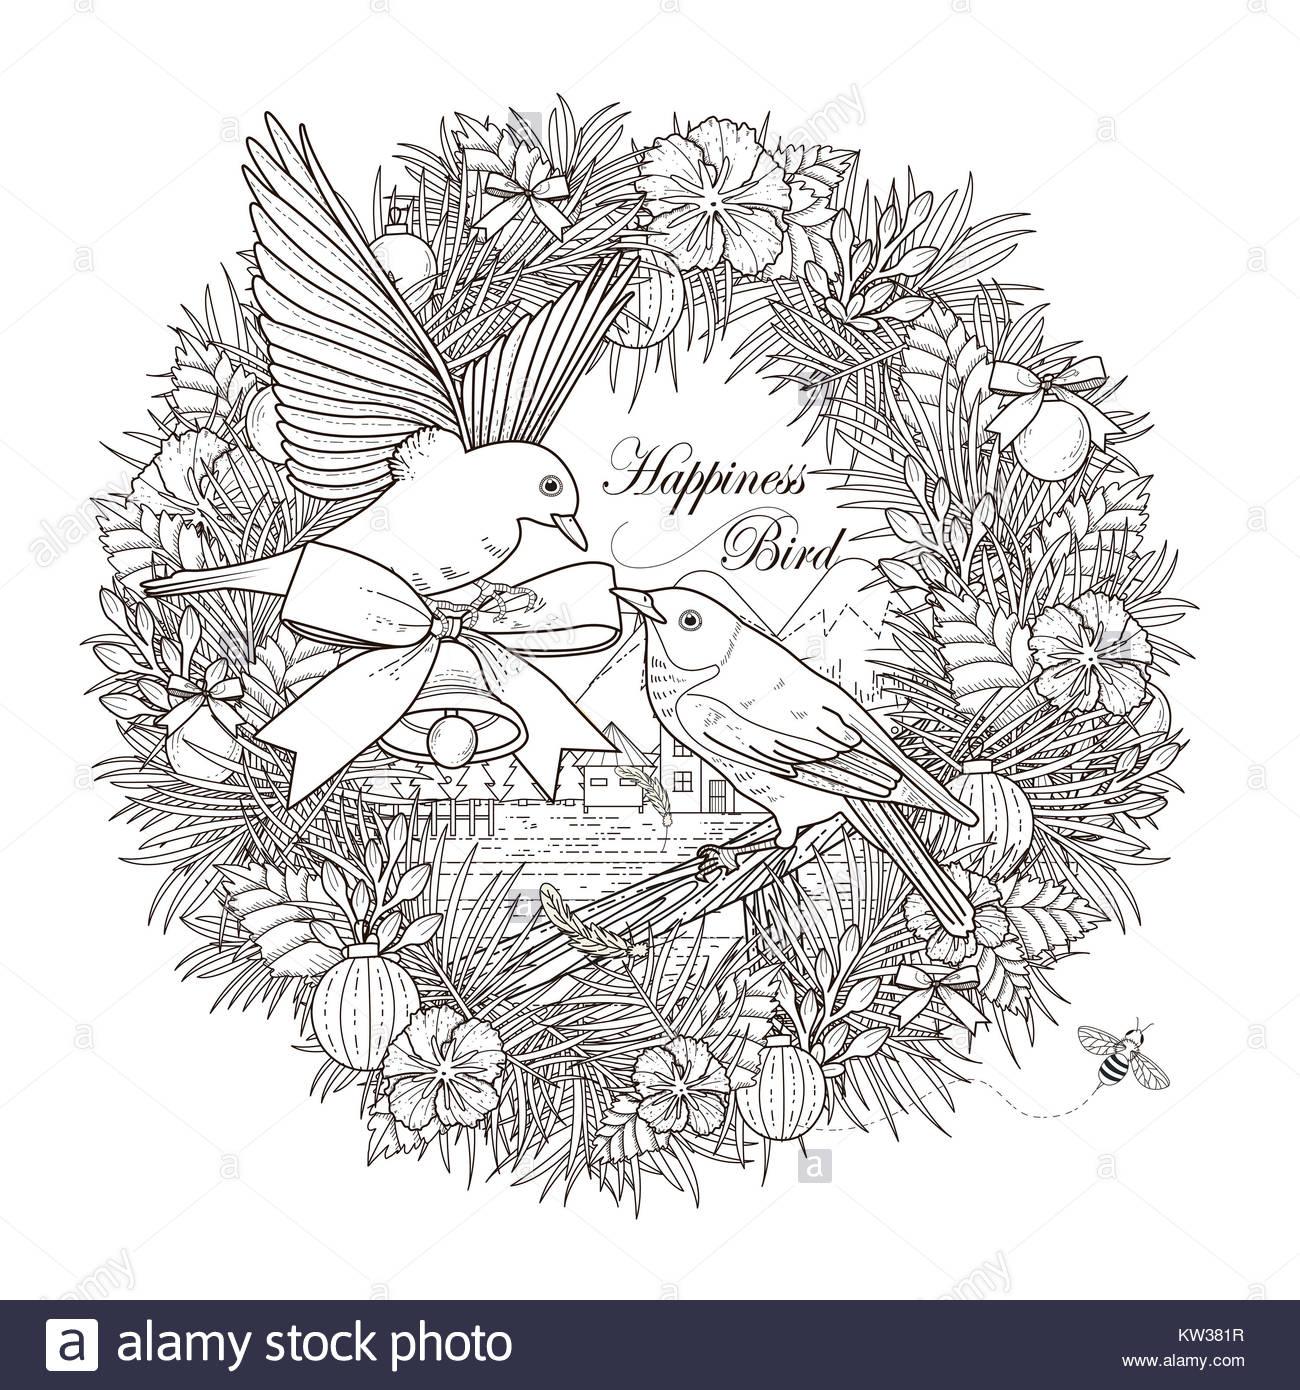 Romantic Birds Stockfotos & Romantic Birds Bilder - Alamy